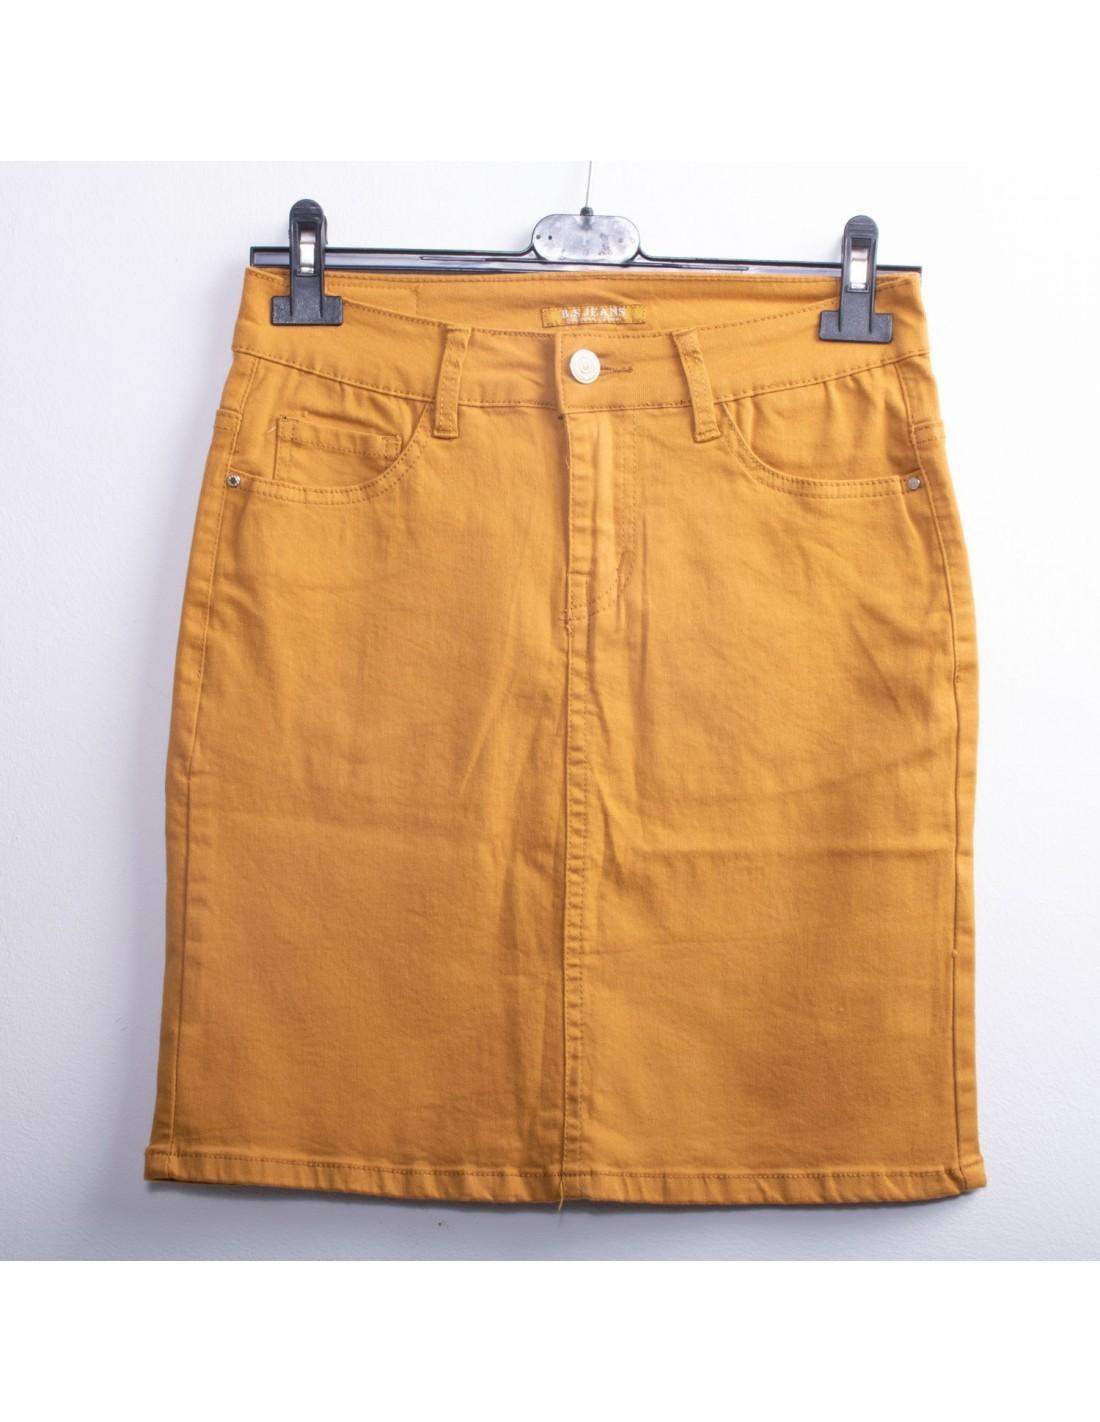 Jupe en jean femme taille haute stretch jaune moutarde 36 au 44